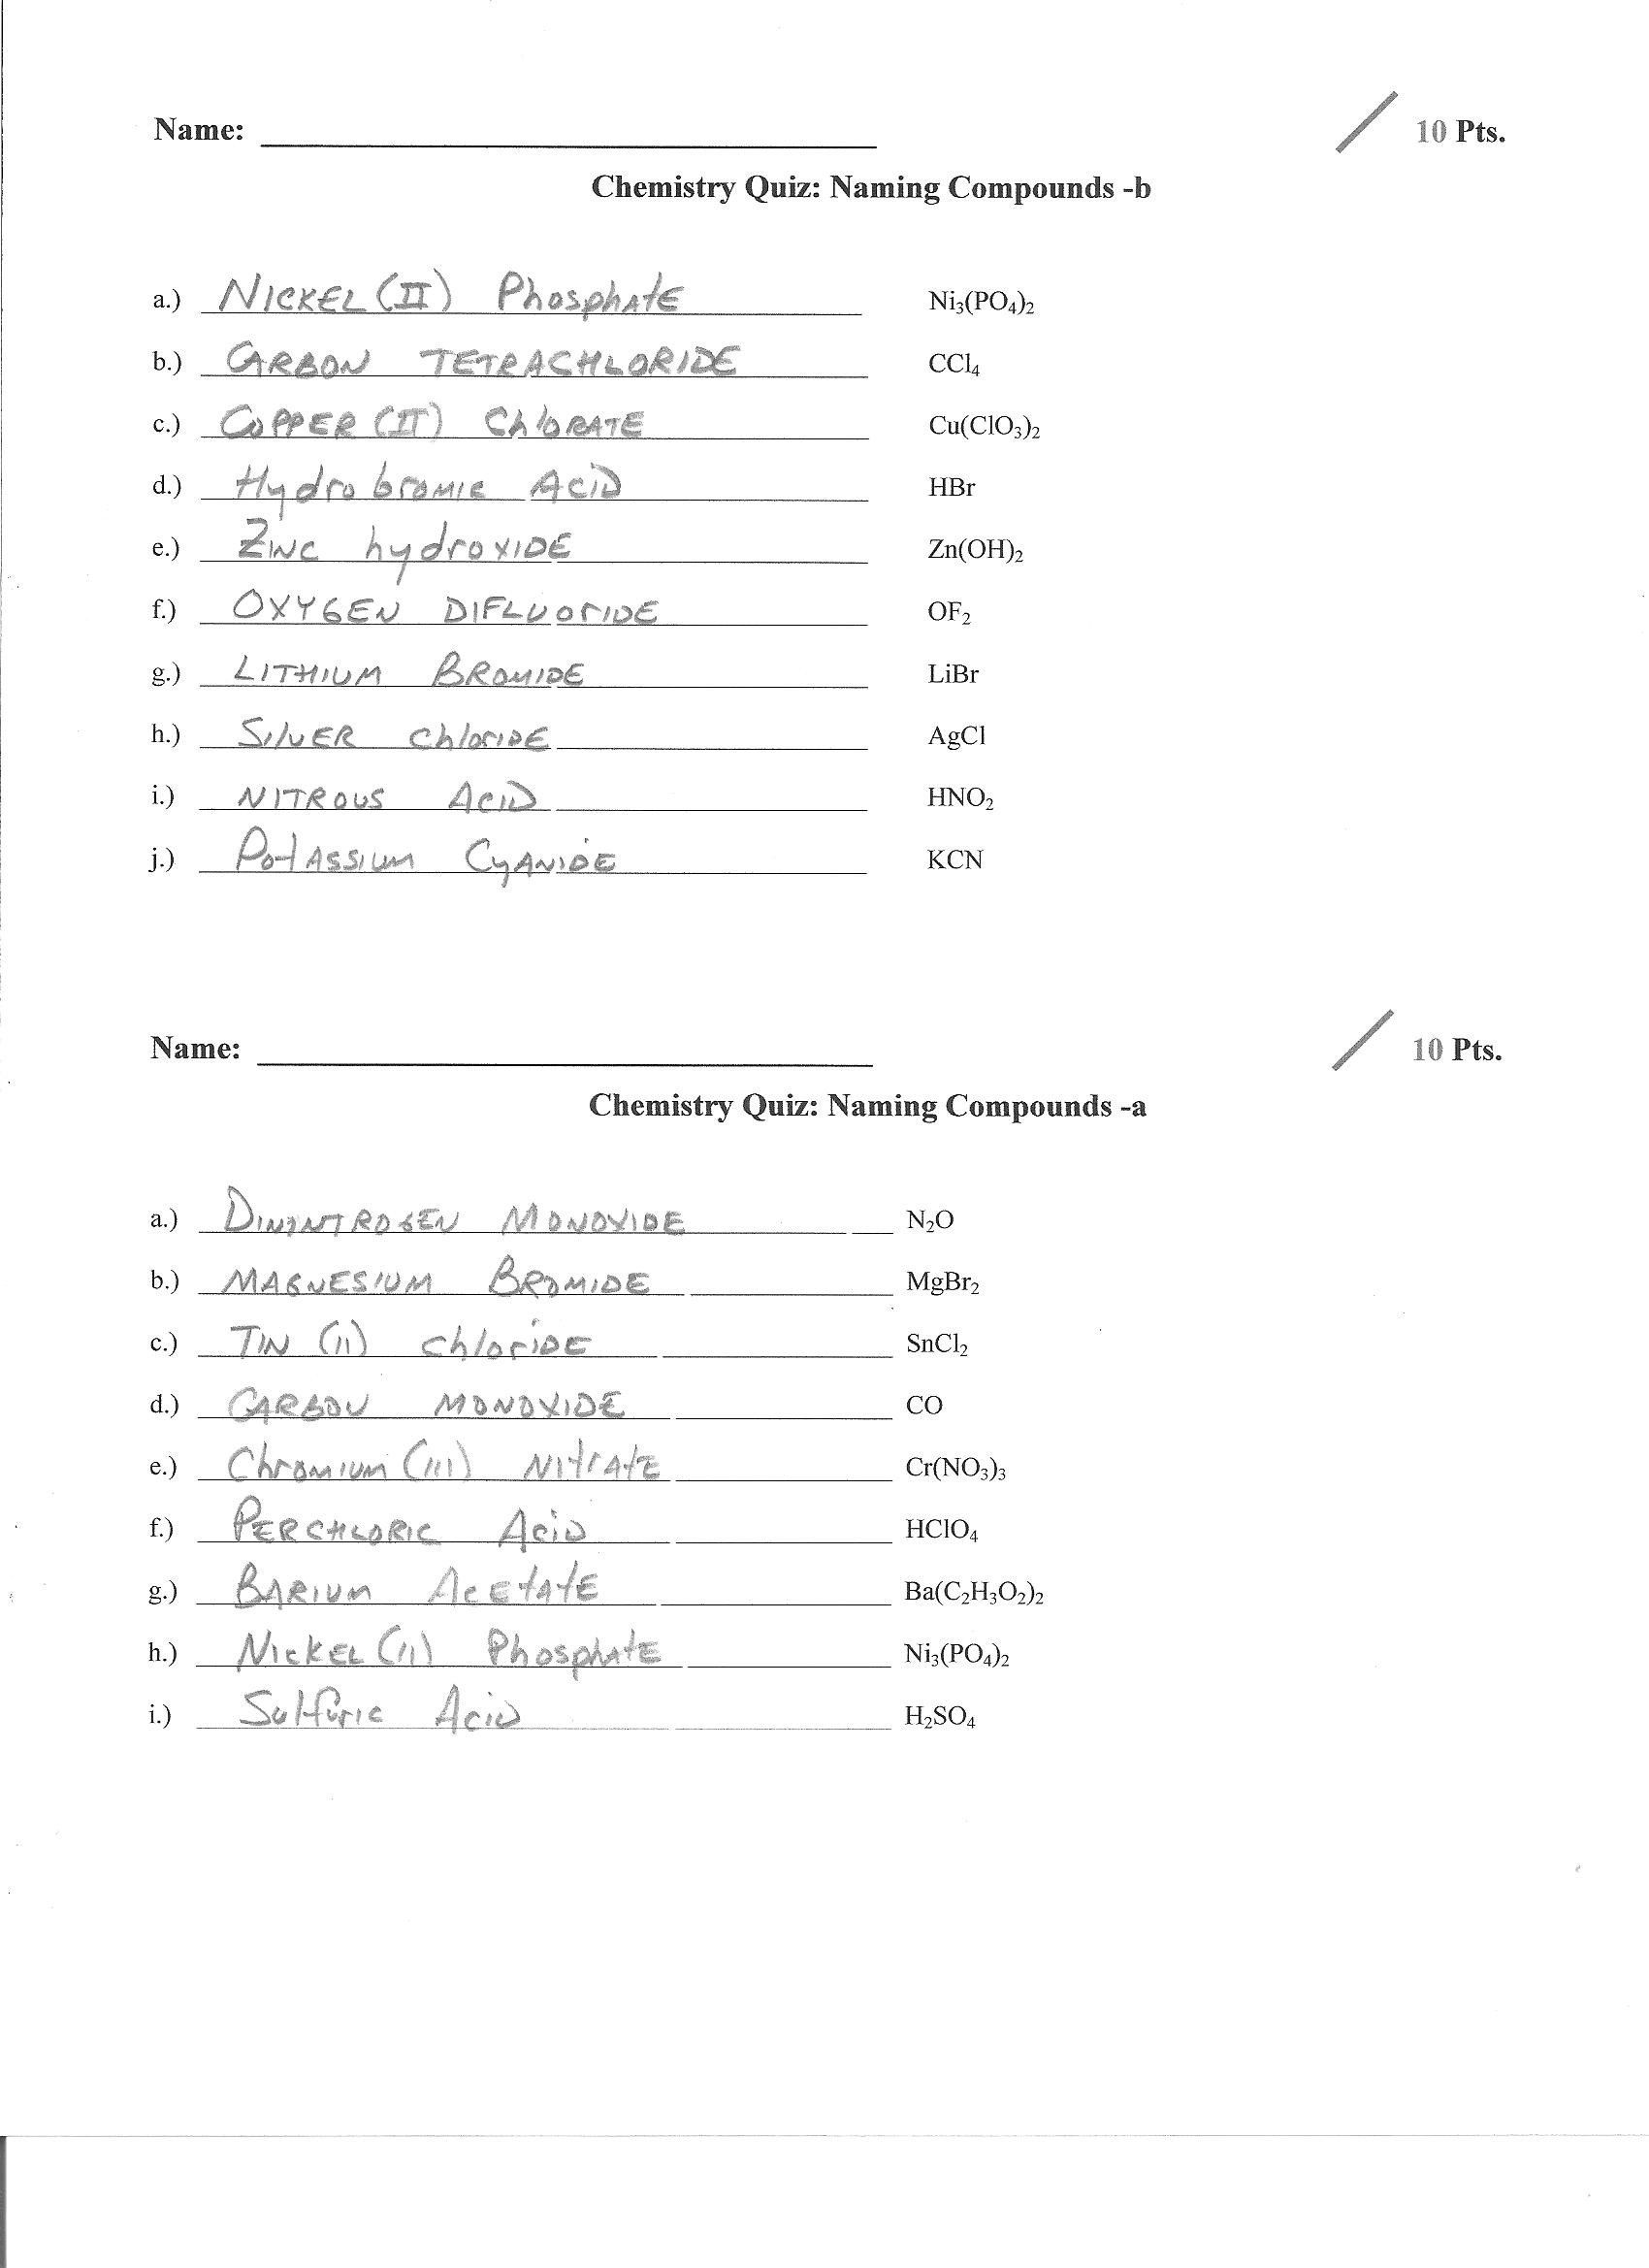 Naming Compounds Worksheet Answer Key Worksheet 3 Naming Pounds And Nome In 2020 Naming Compounds Worksheet Reading Comprehension Worksheets Kids Worksheets Printables